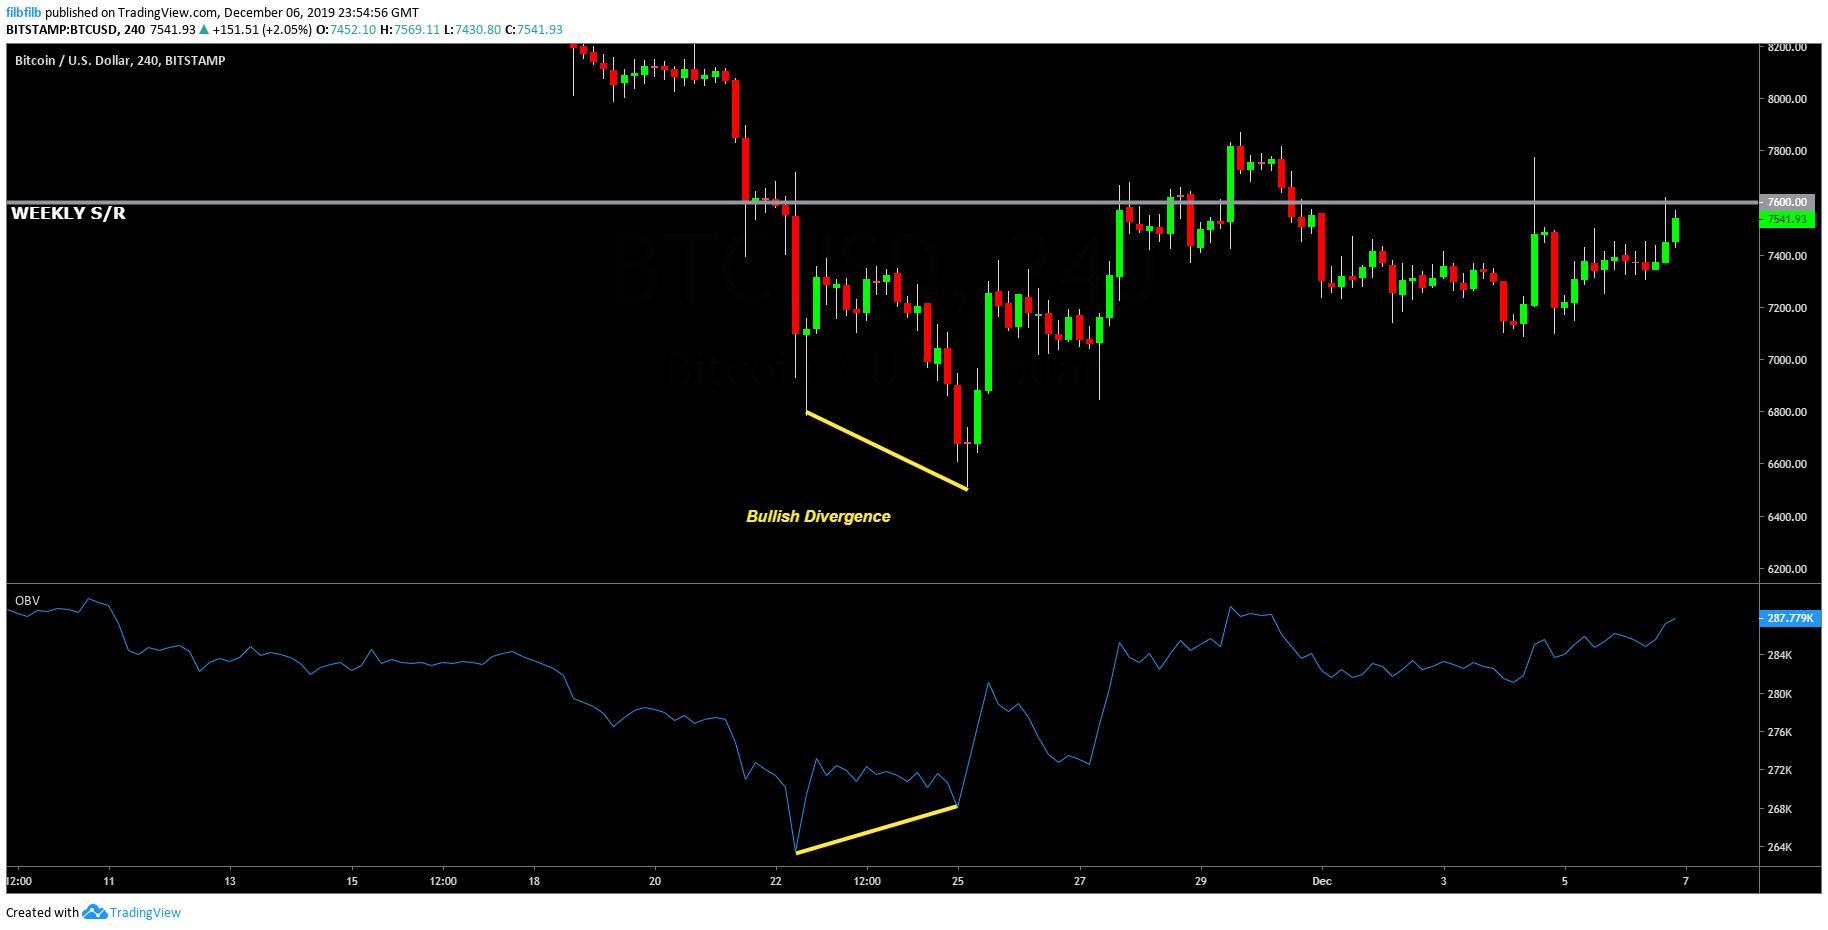 Bitcoin bullish divergences